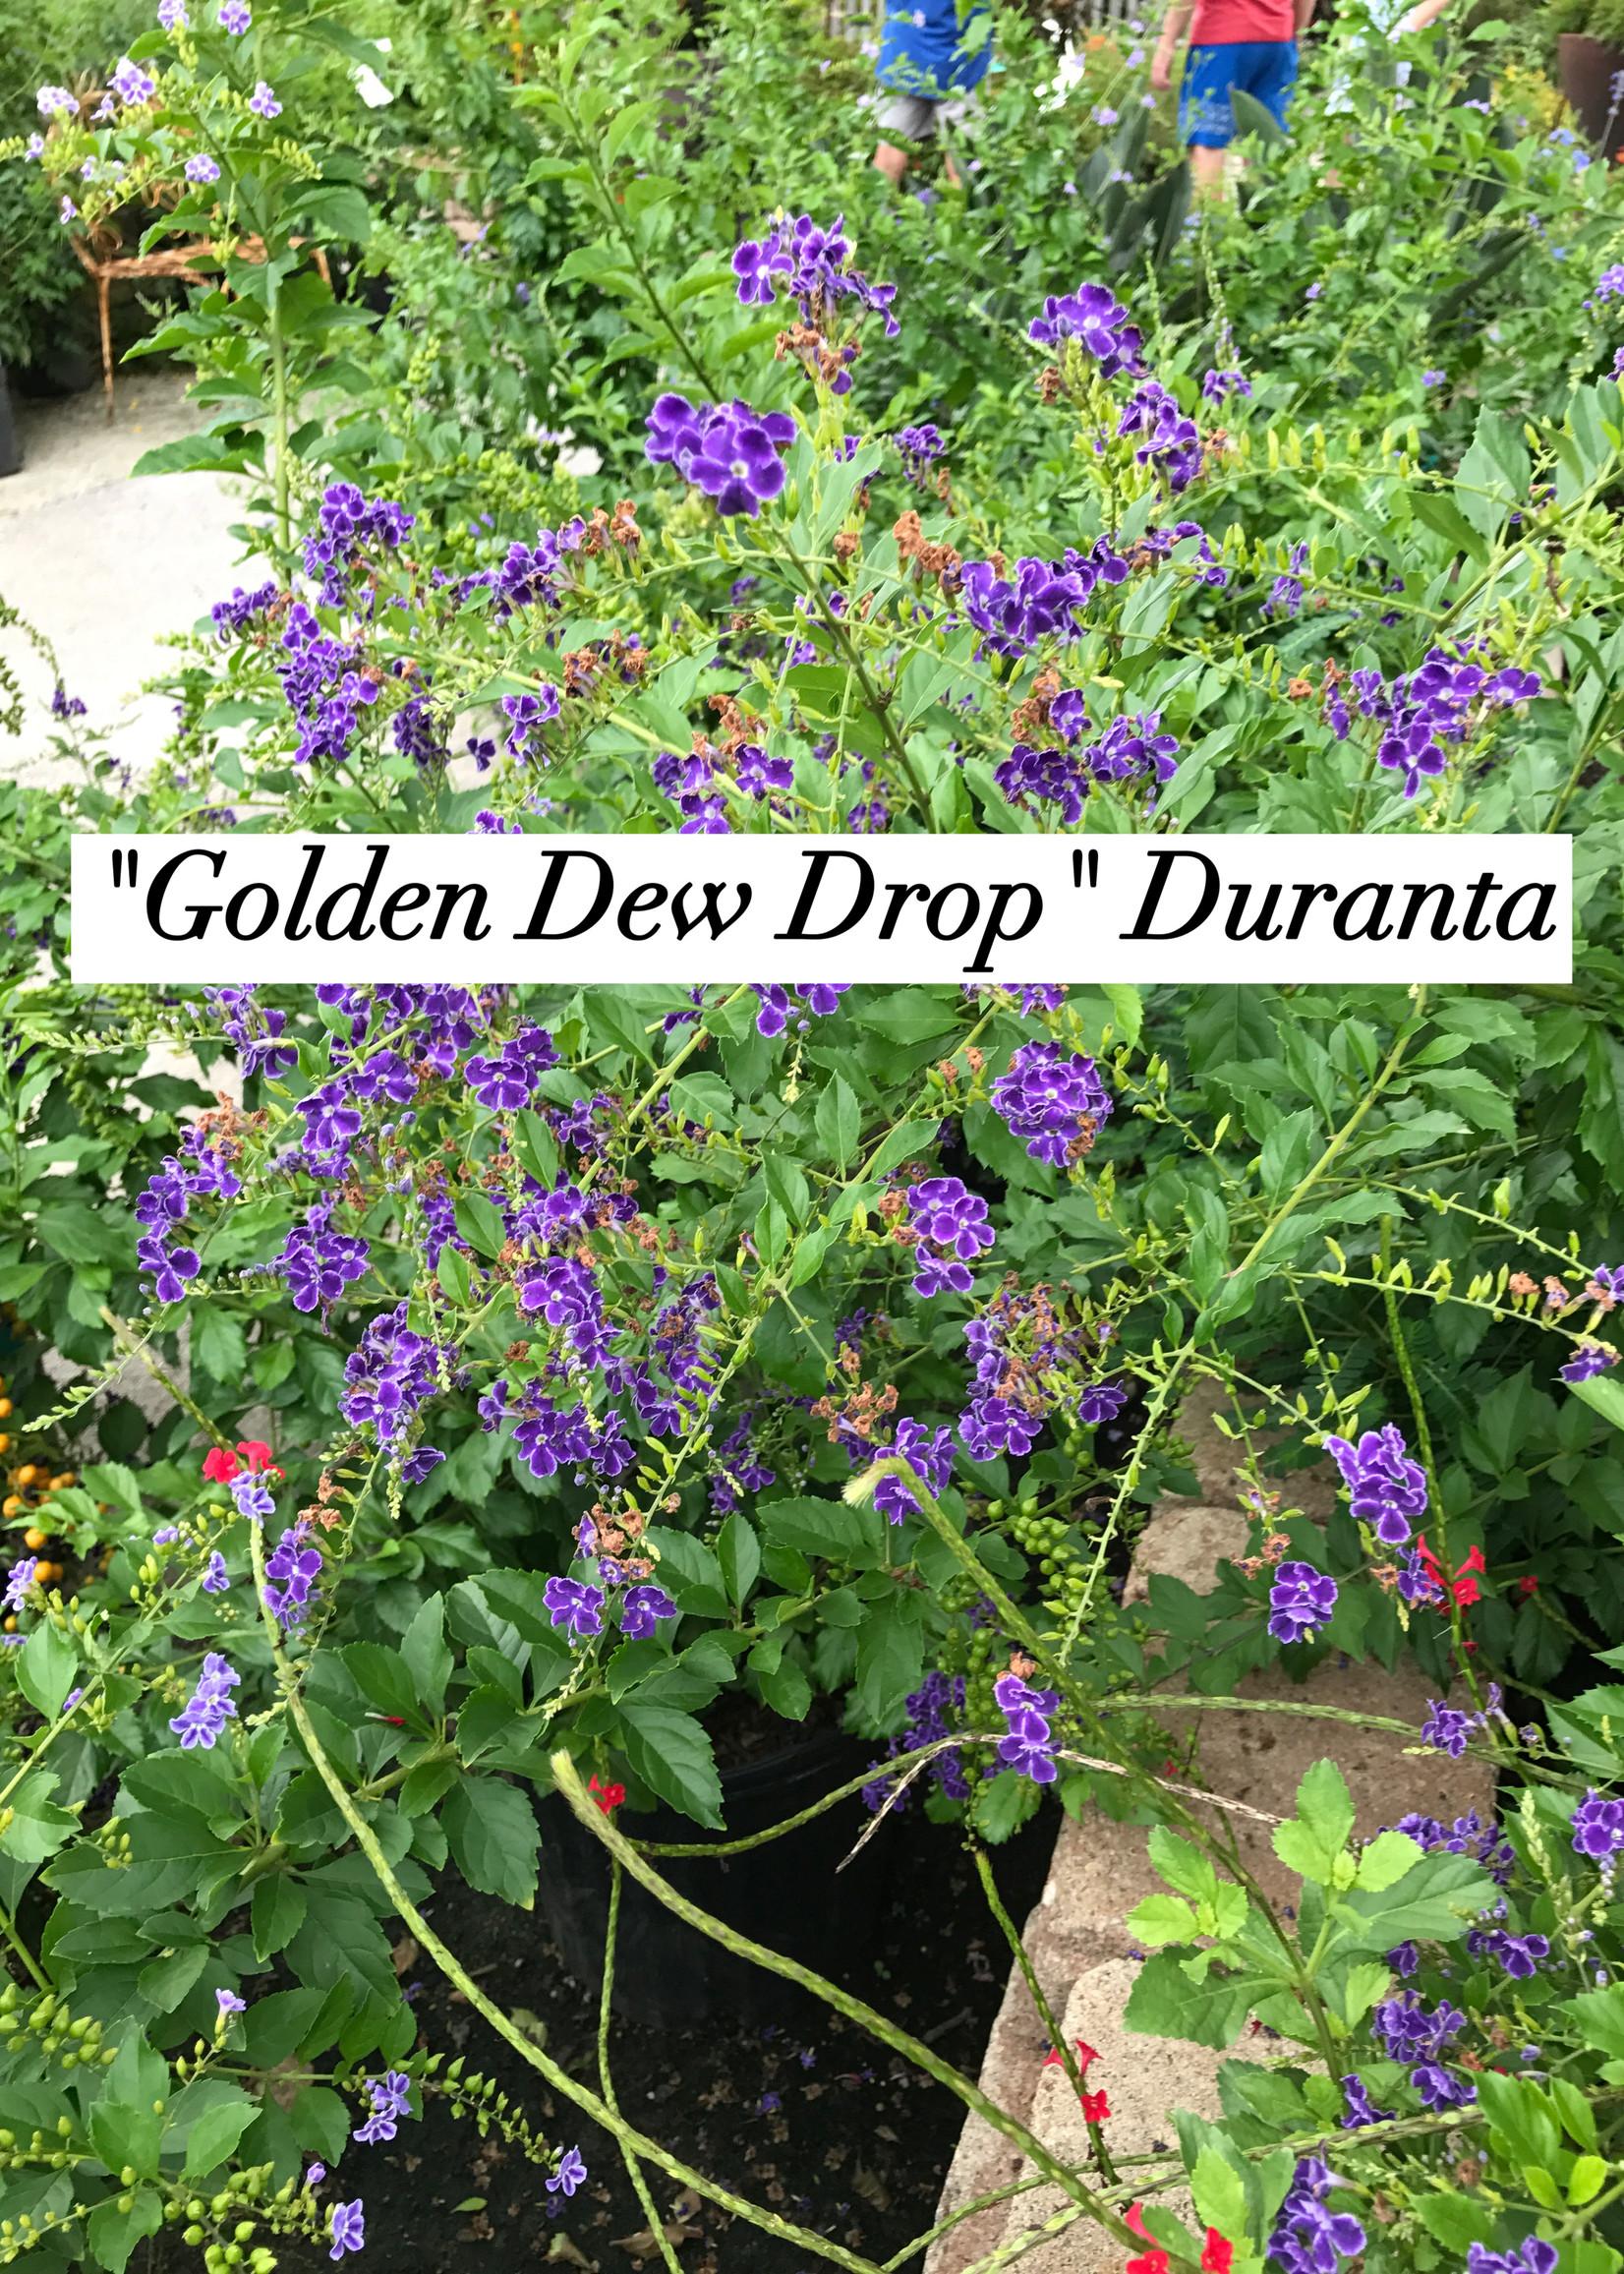 DURANTA, GOLDEN DEW DROP 3G